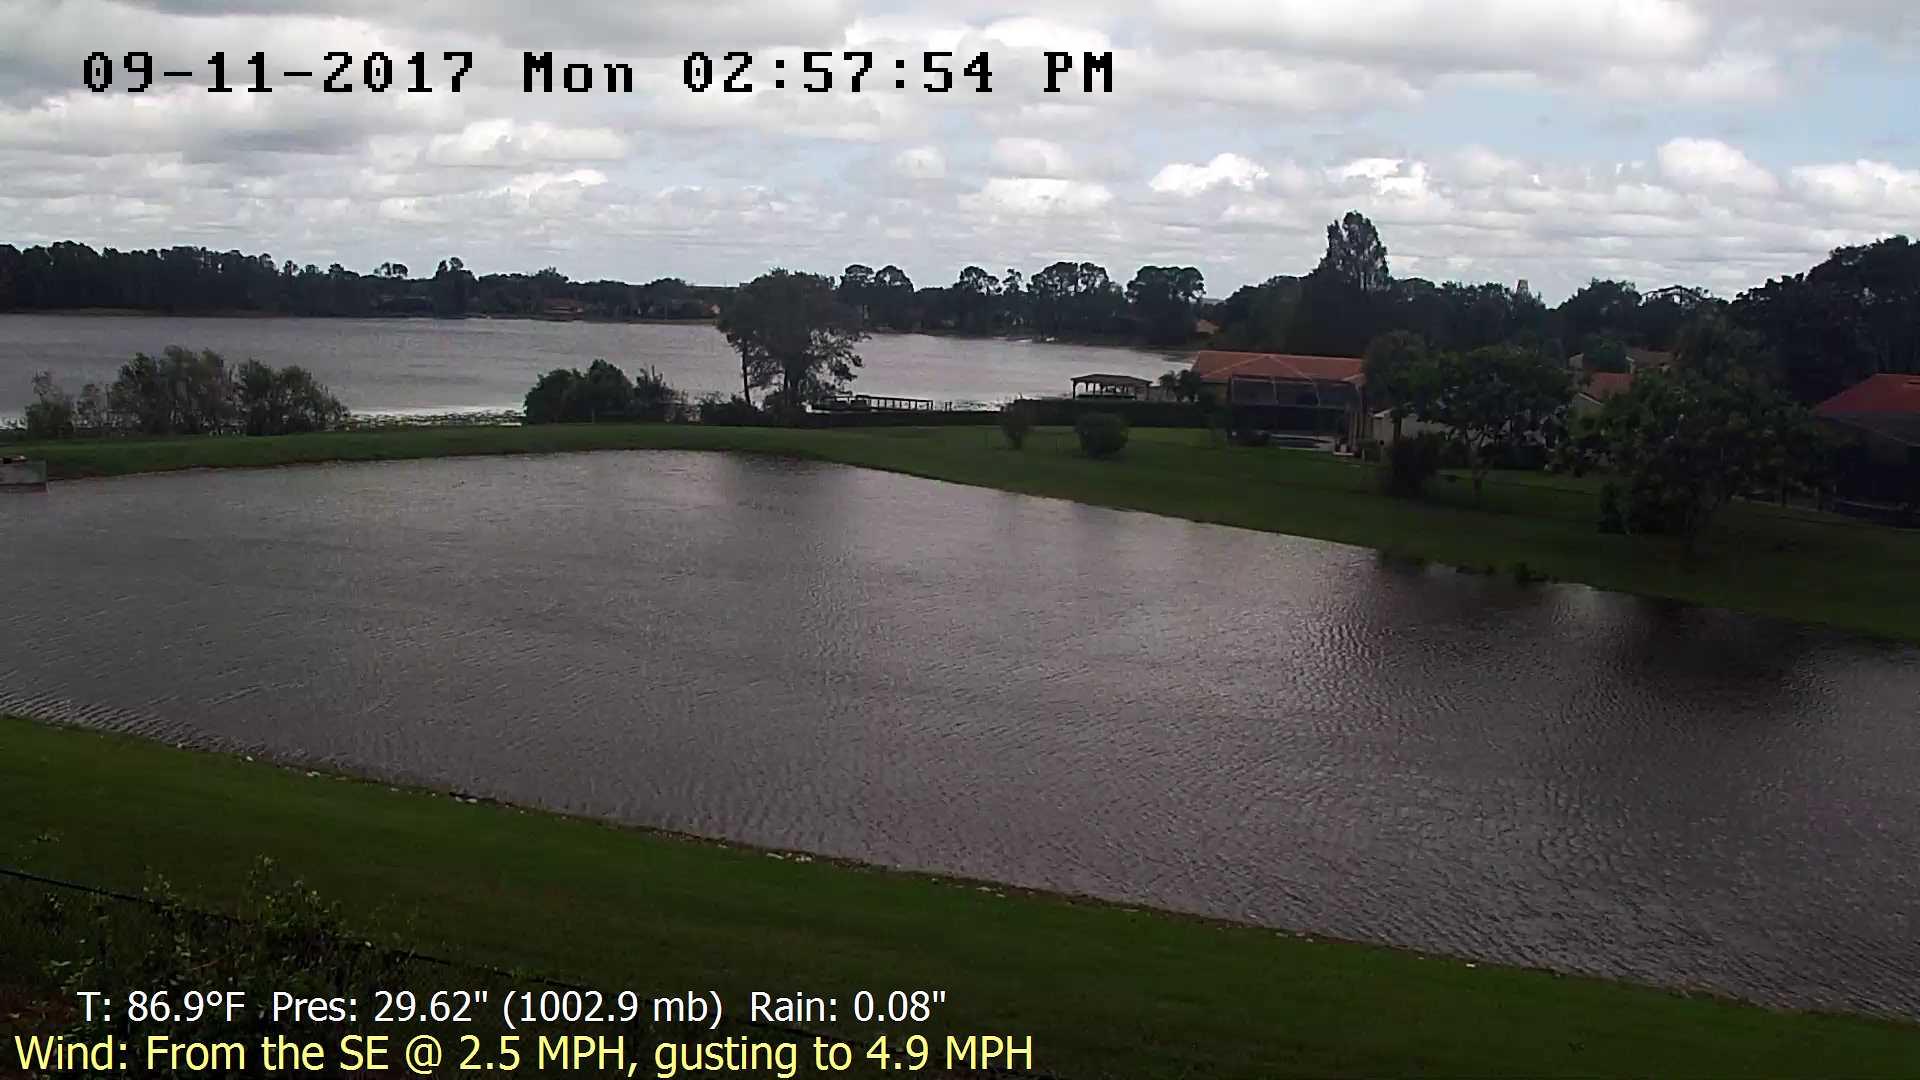 Flhurricane Orlando Lake Marsha Cam recording approach of Irma (2017)